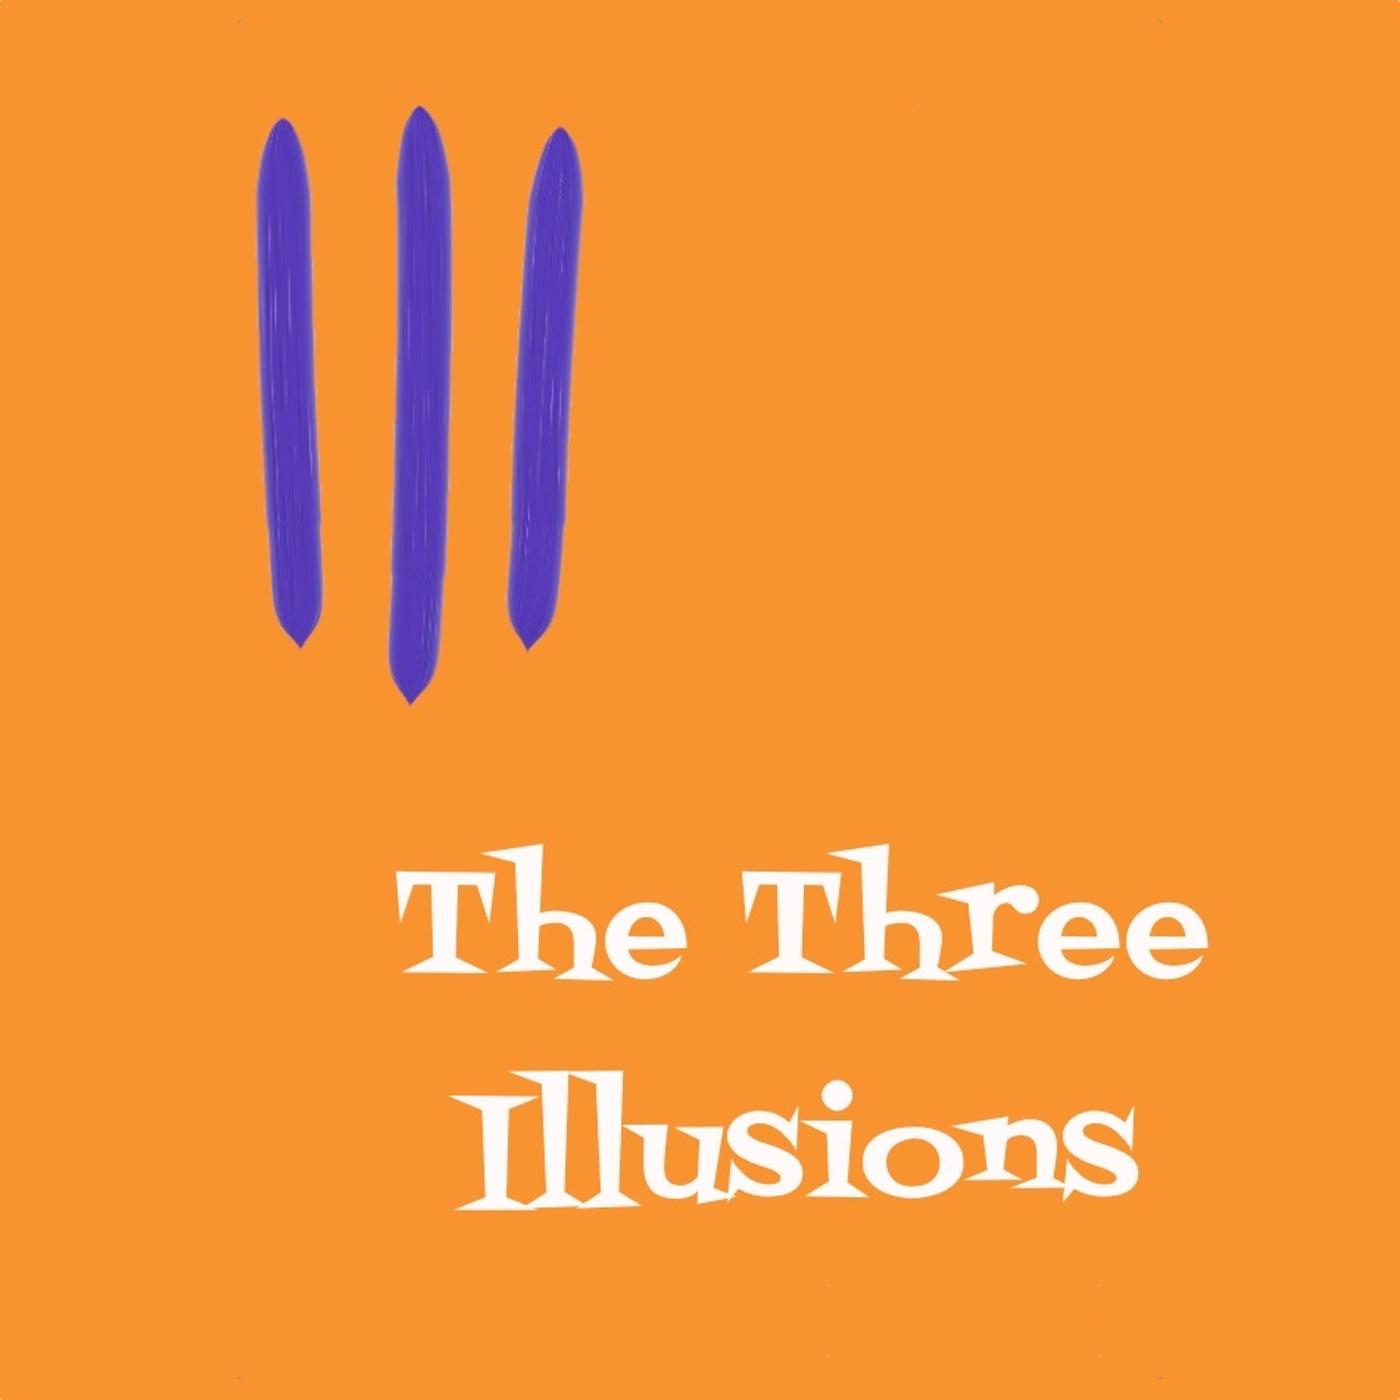 The Three Illusions